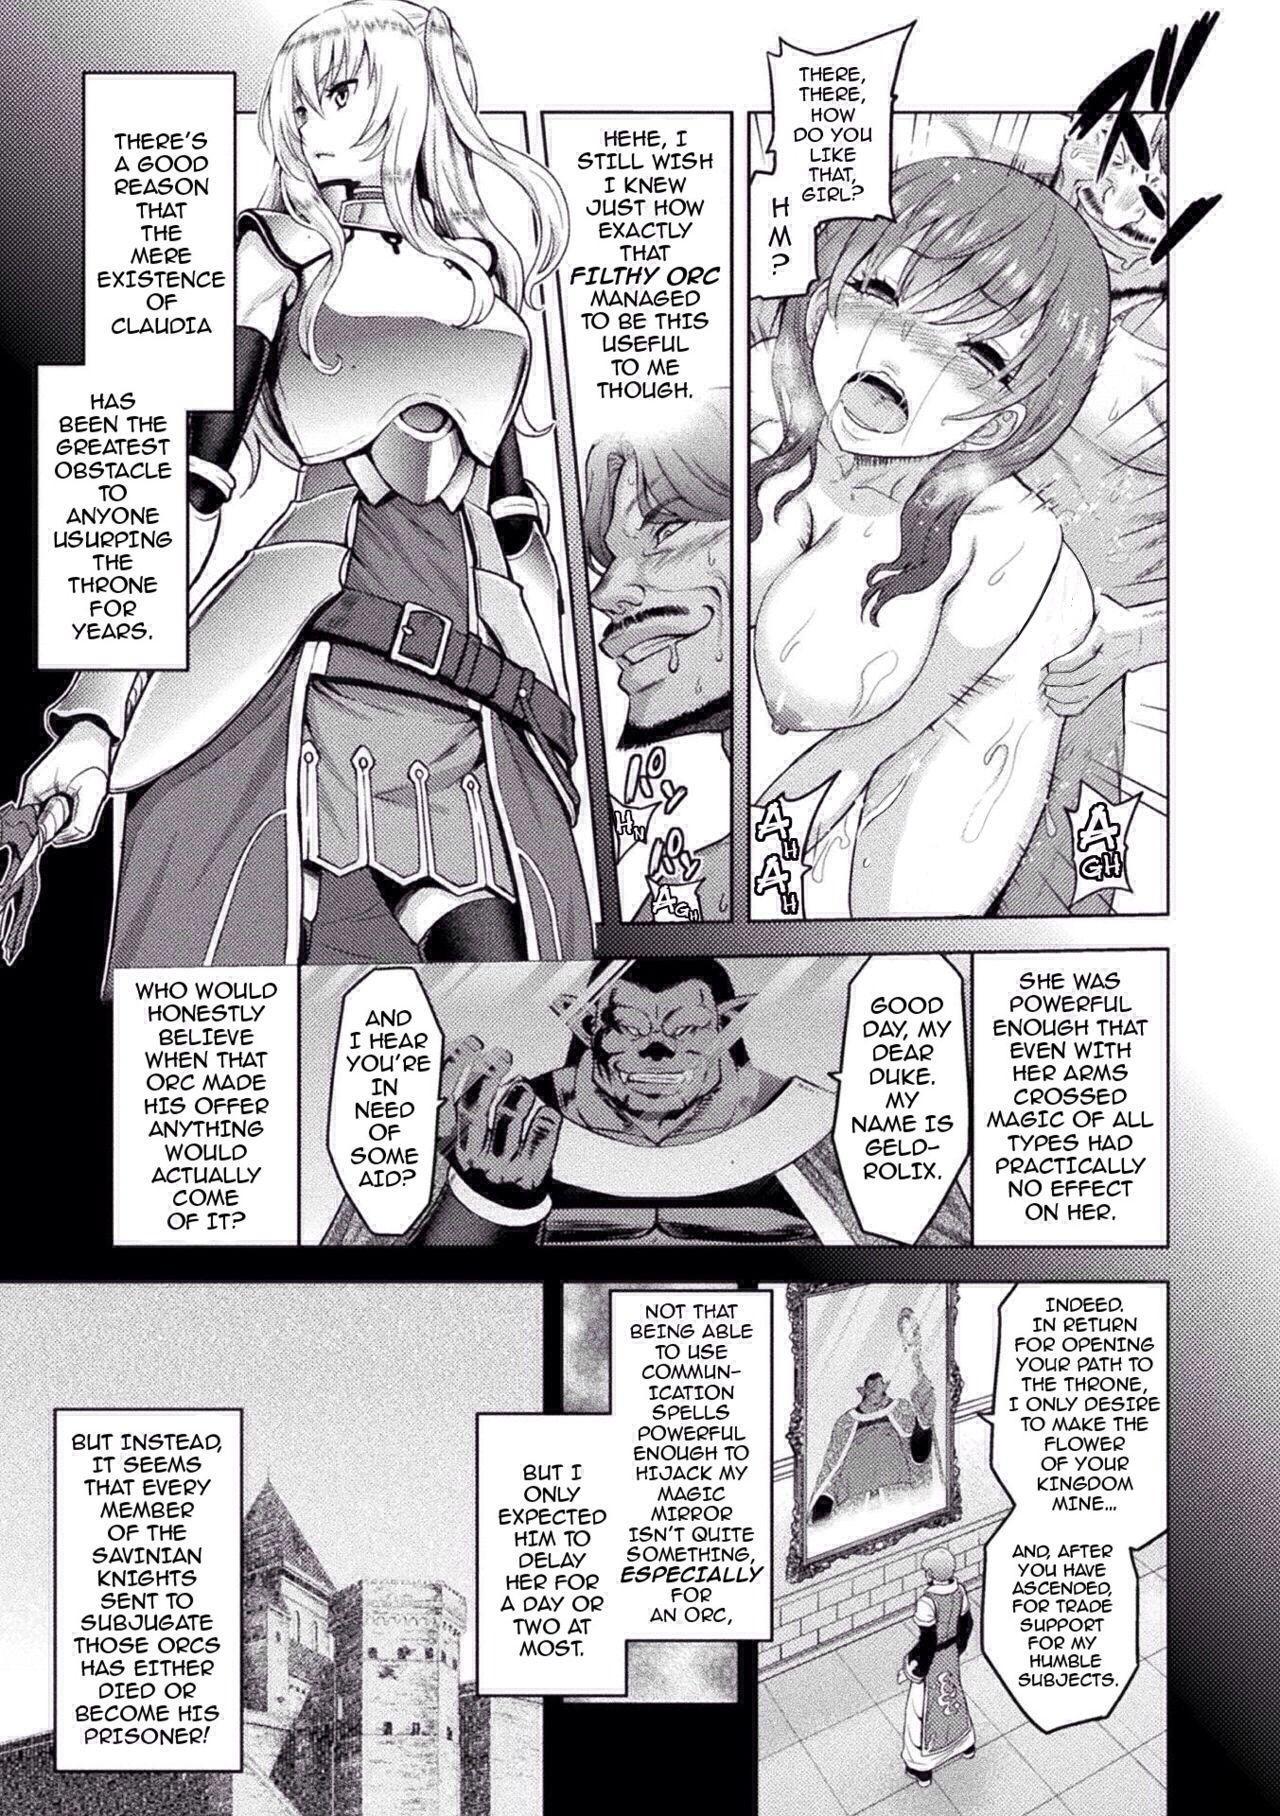 [Yamada Gogogo] Erona ~Orc no Inmon ni Okasareta Onna Kishi no Matsuro~ | Erona ~The Fall of a Beautiful Knight Cursed with the Lewd Mark of an Orc~ Ch. 1-6 [English] [darknight] [Decensored] [ongoing] 76